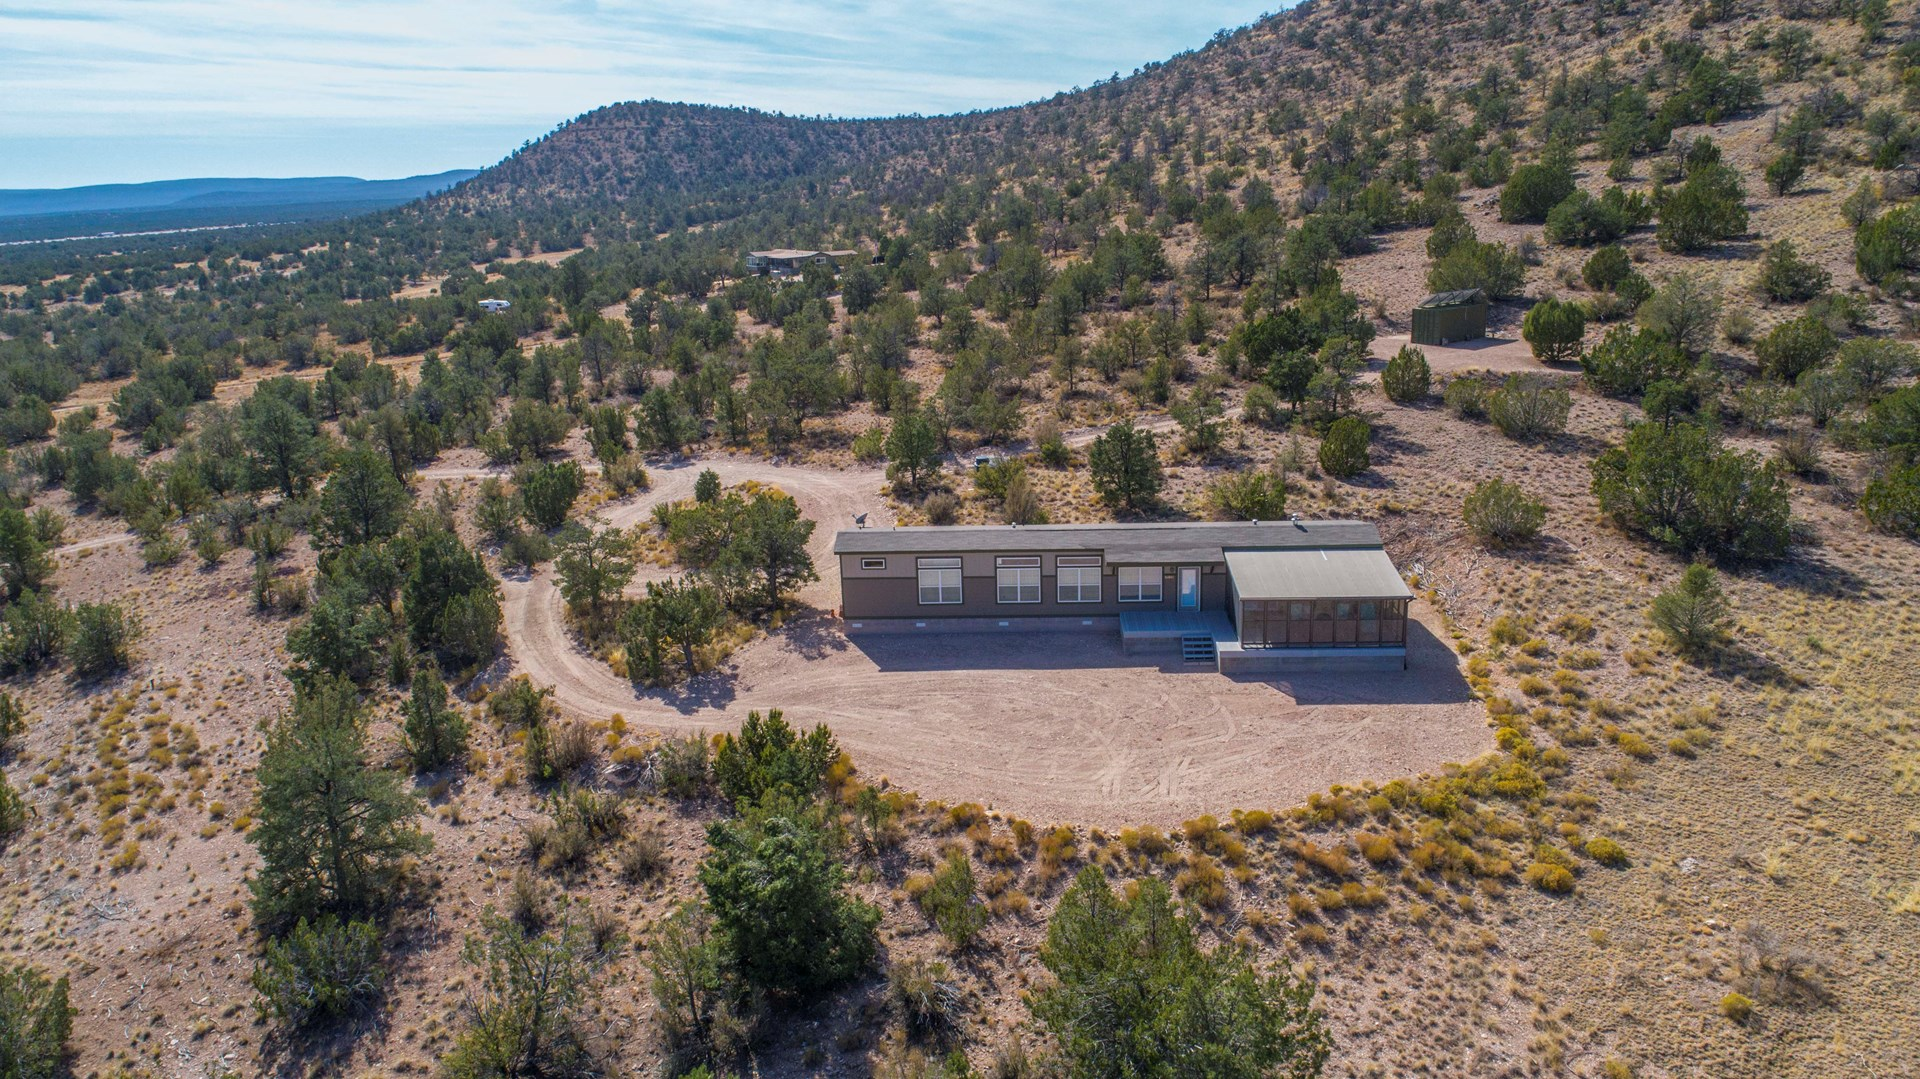 Northern Arizona Home on Acreage and Views